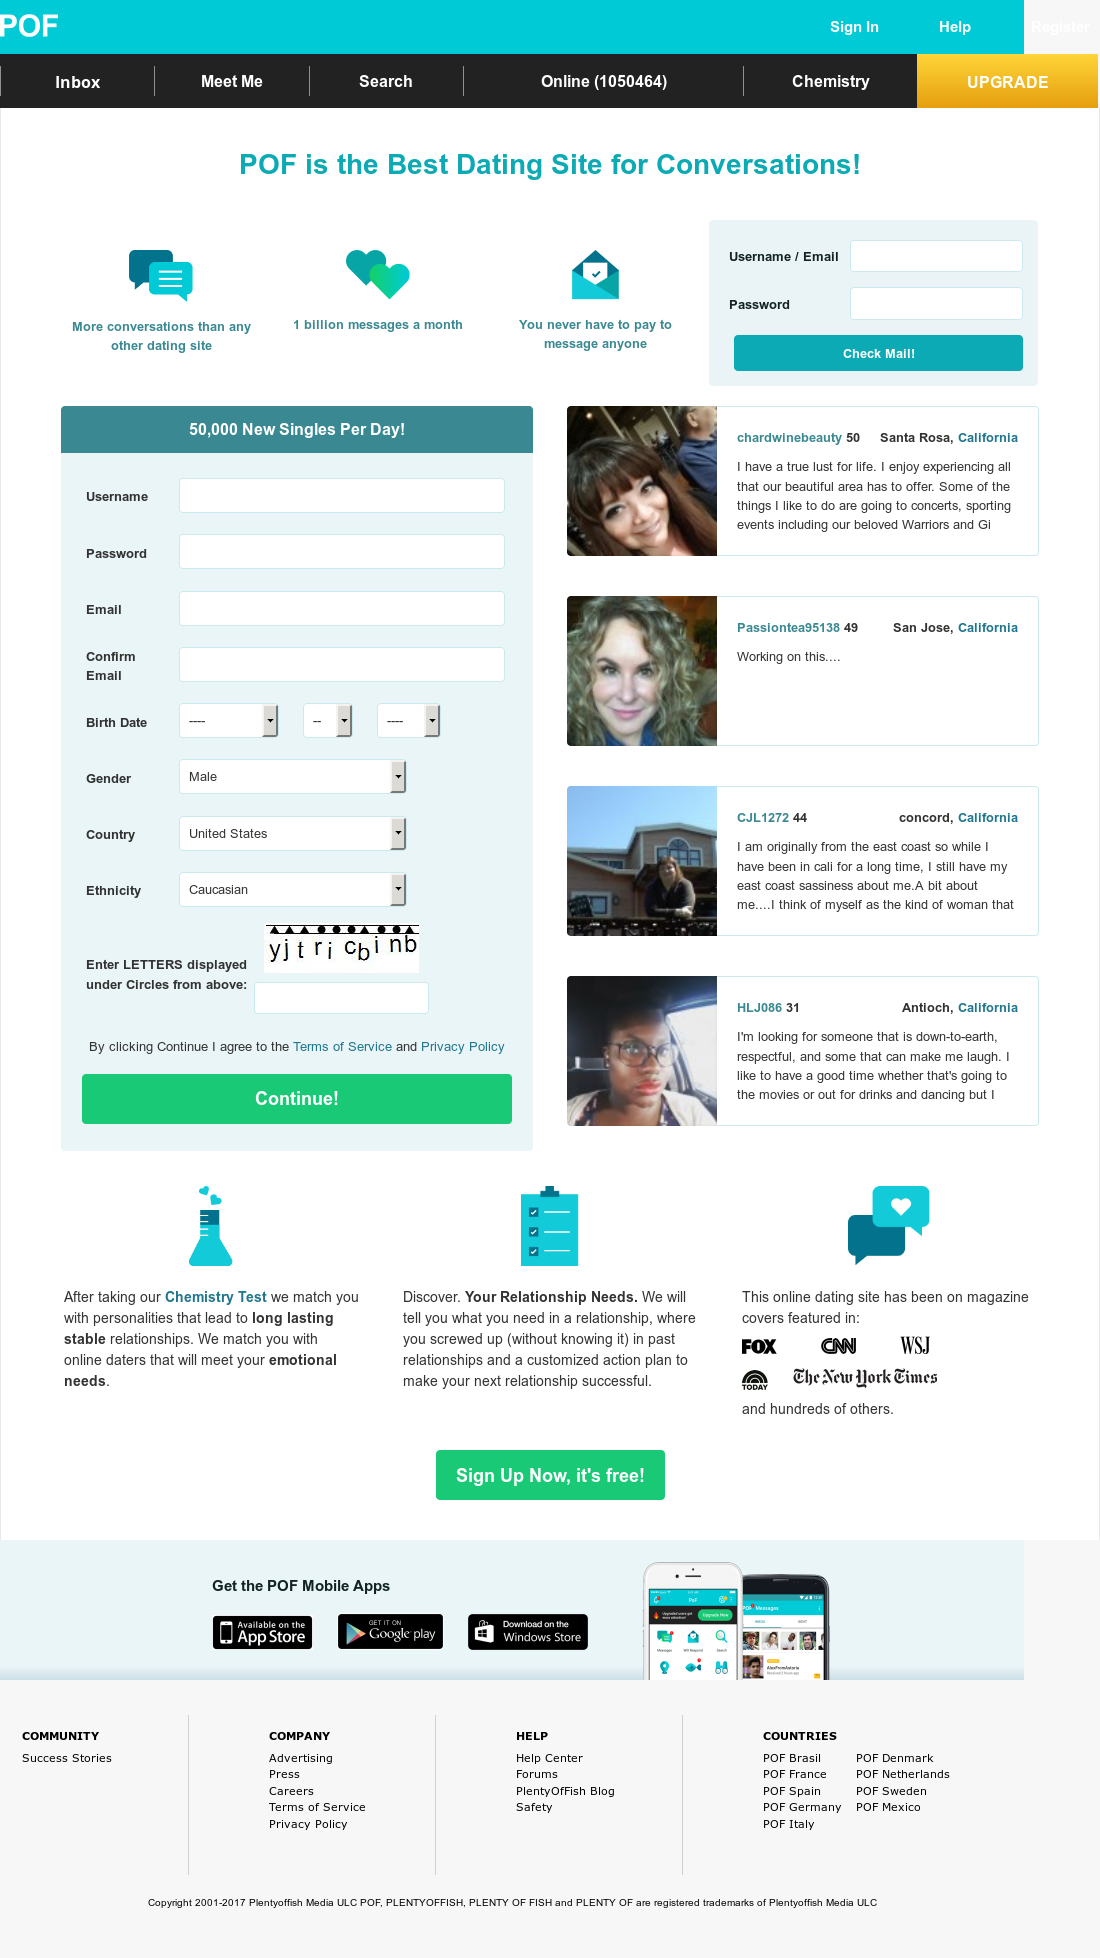 plentyoffish com 100 free online dating url